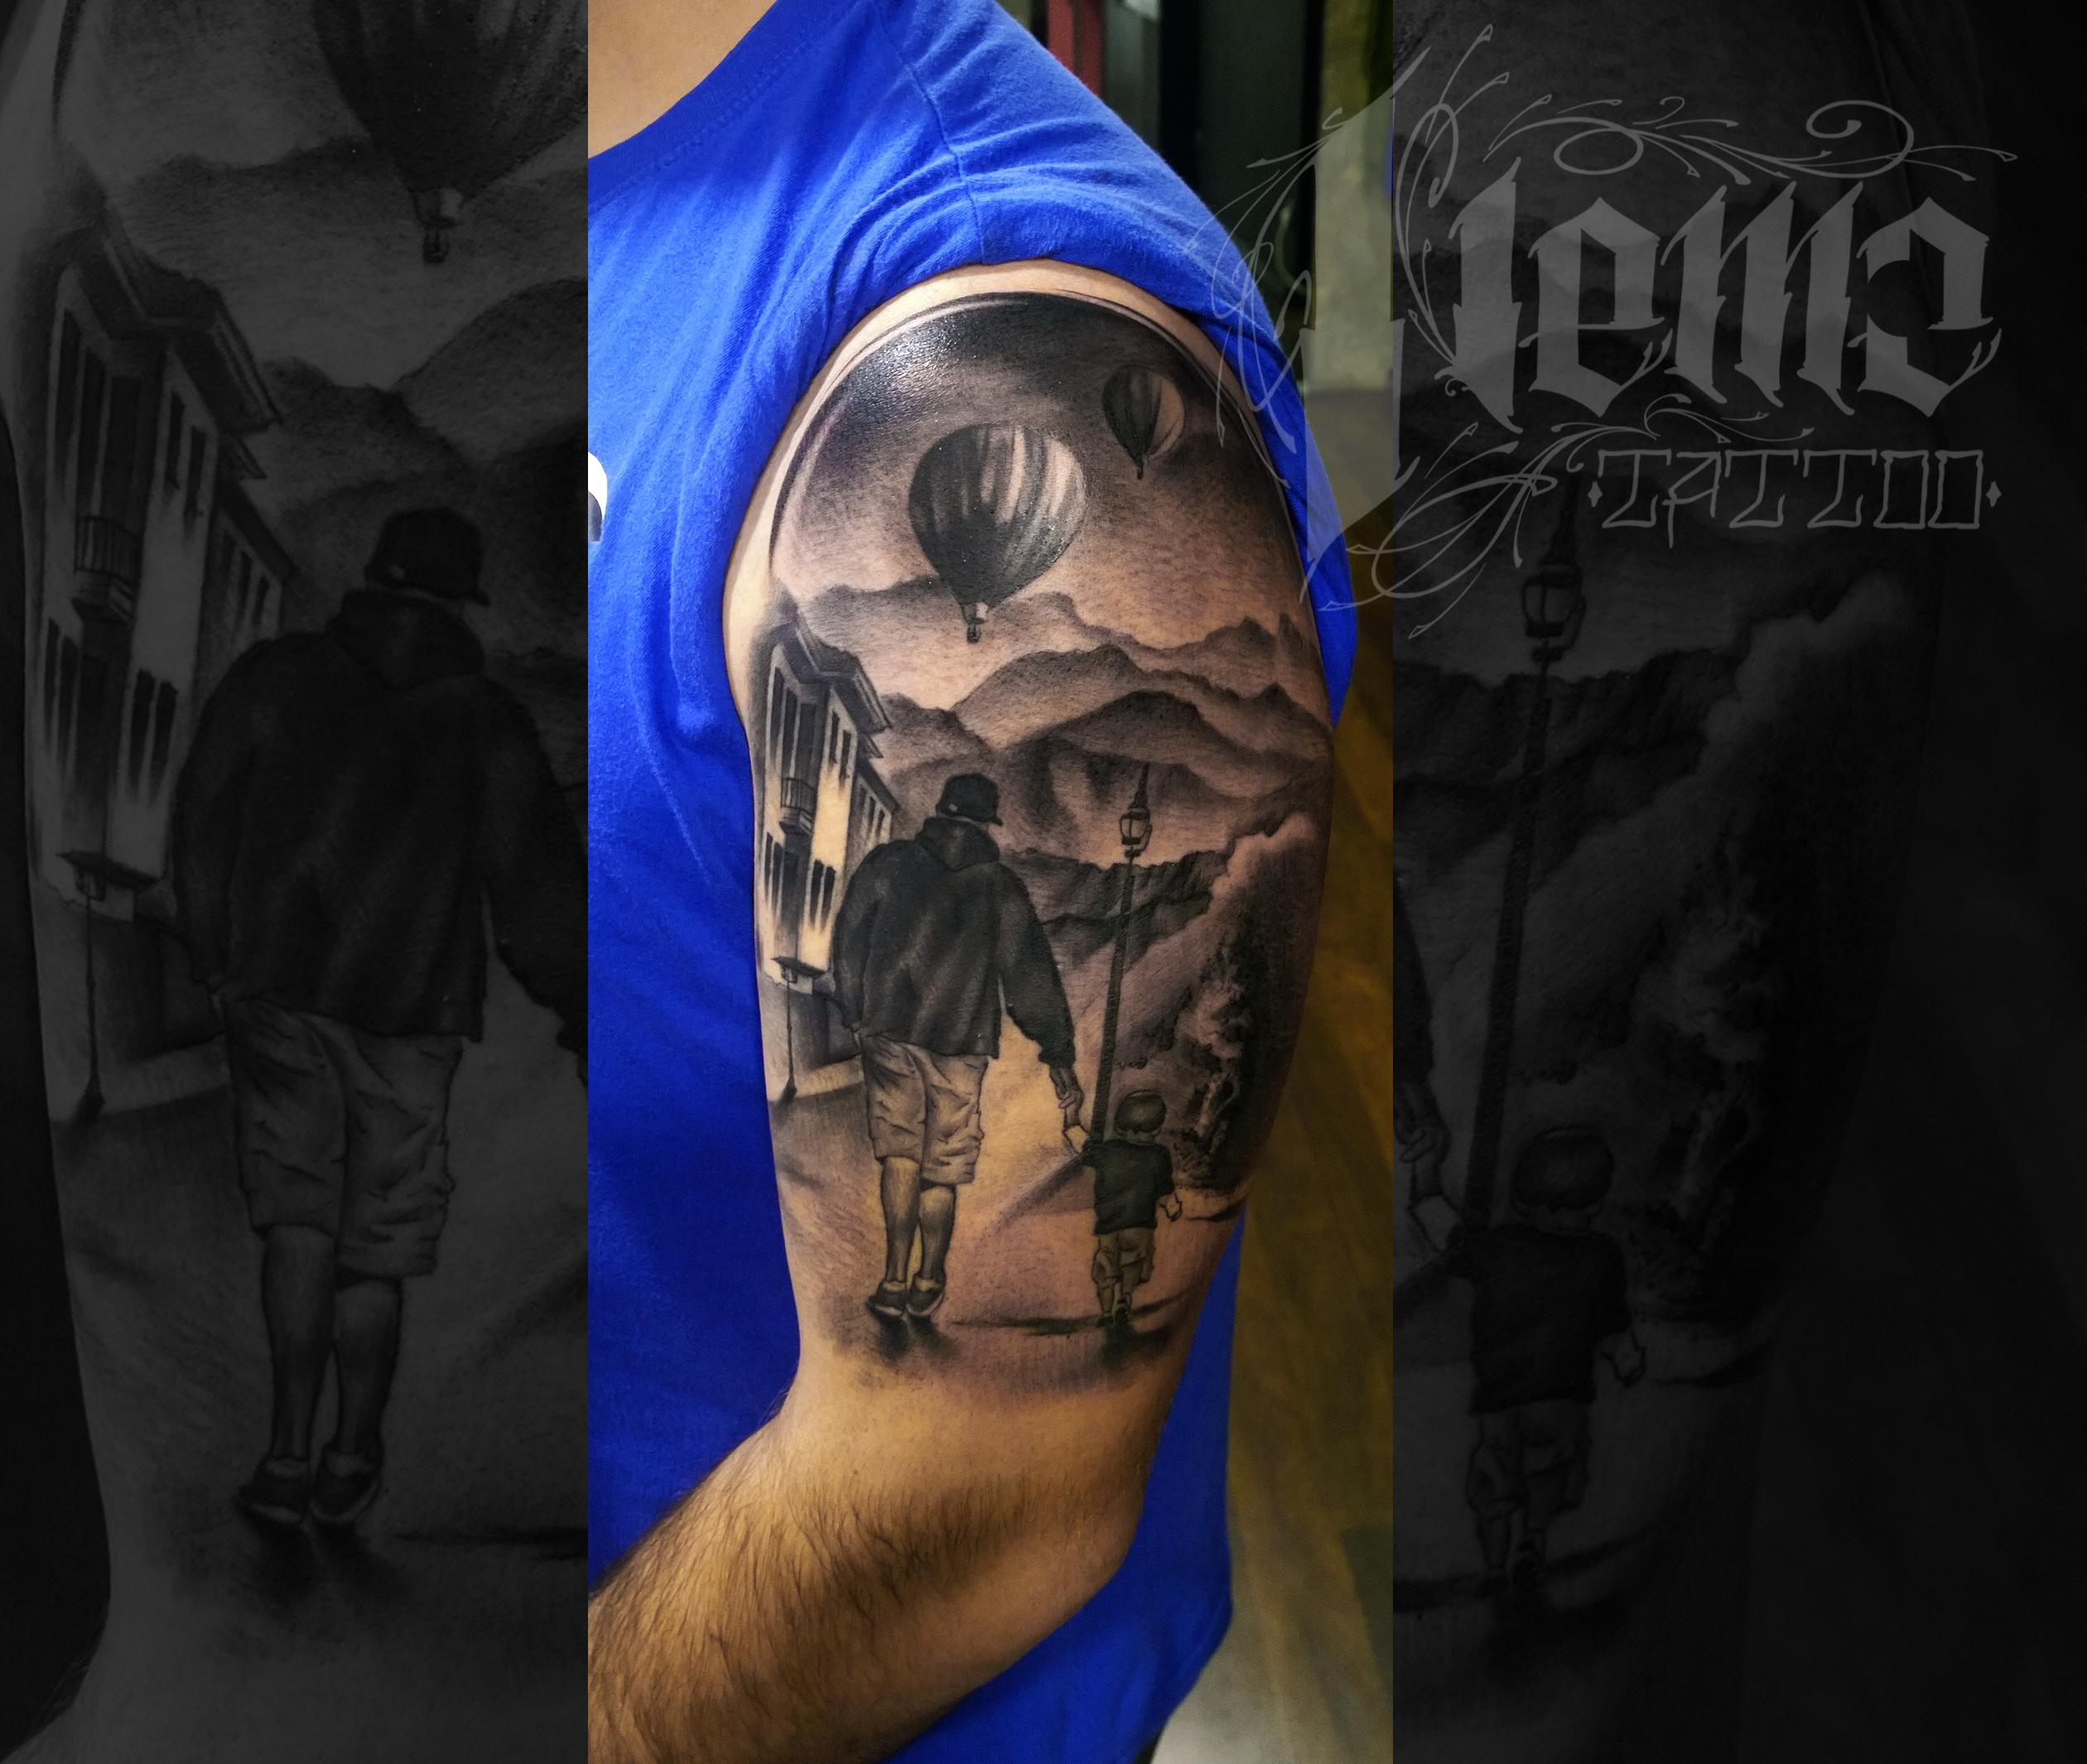 Certified Artist: Dimitris NemeTattoo